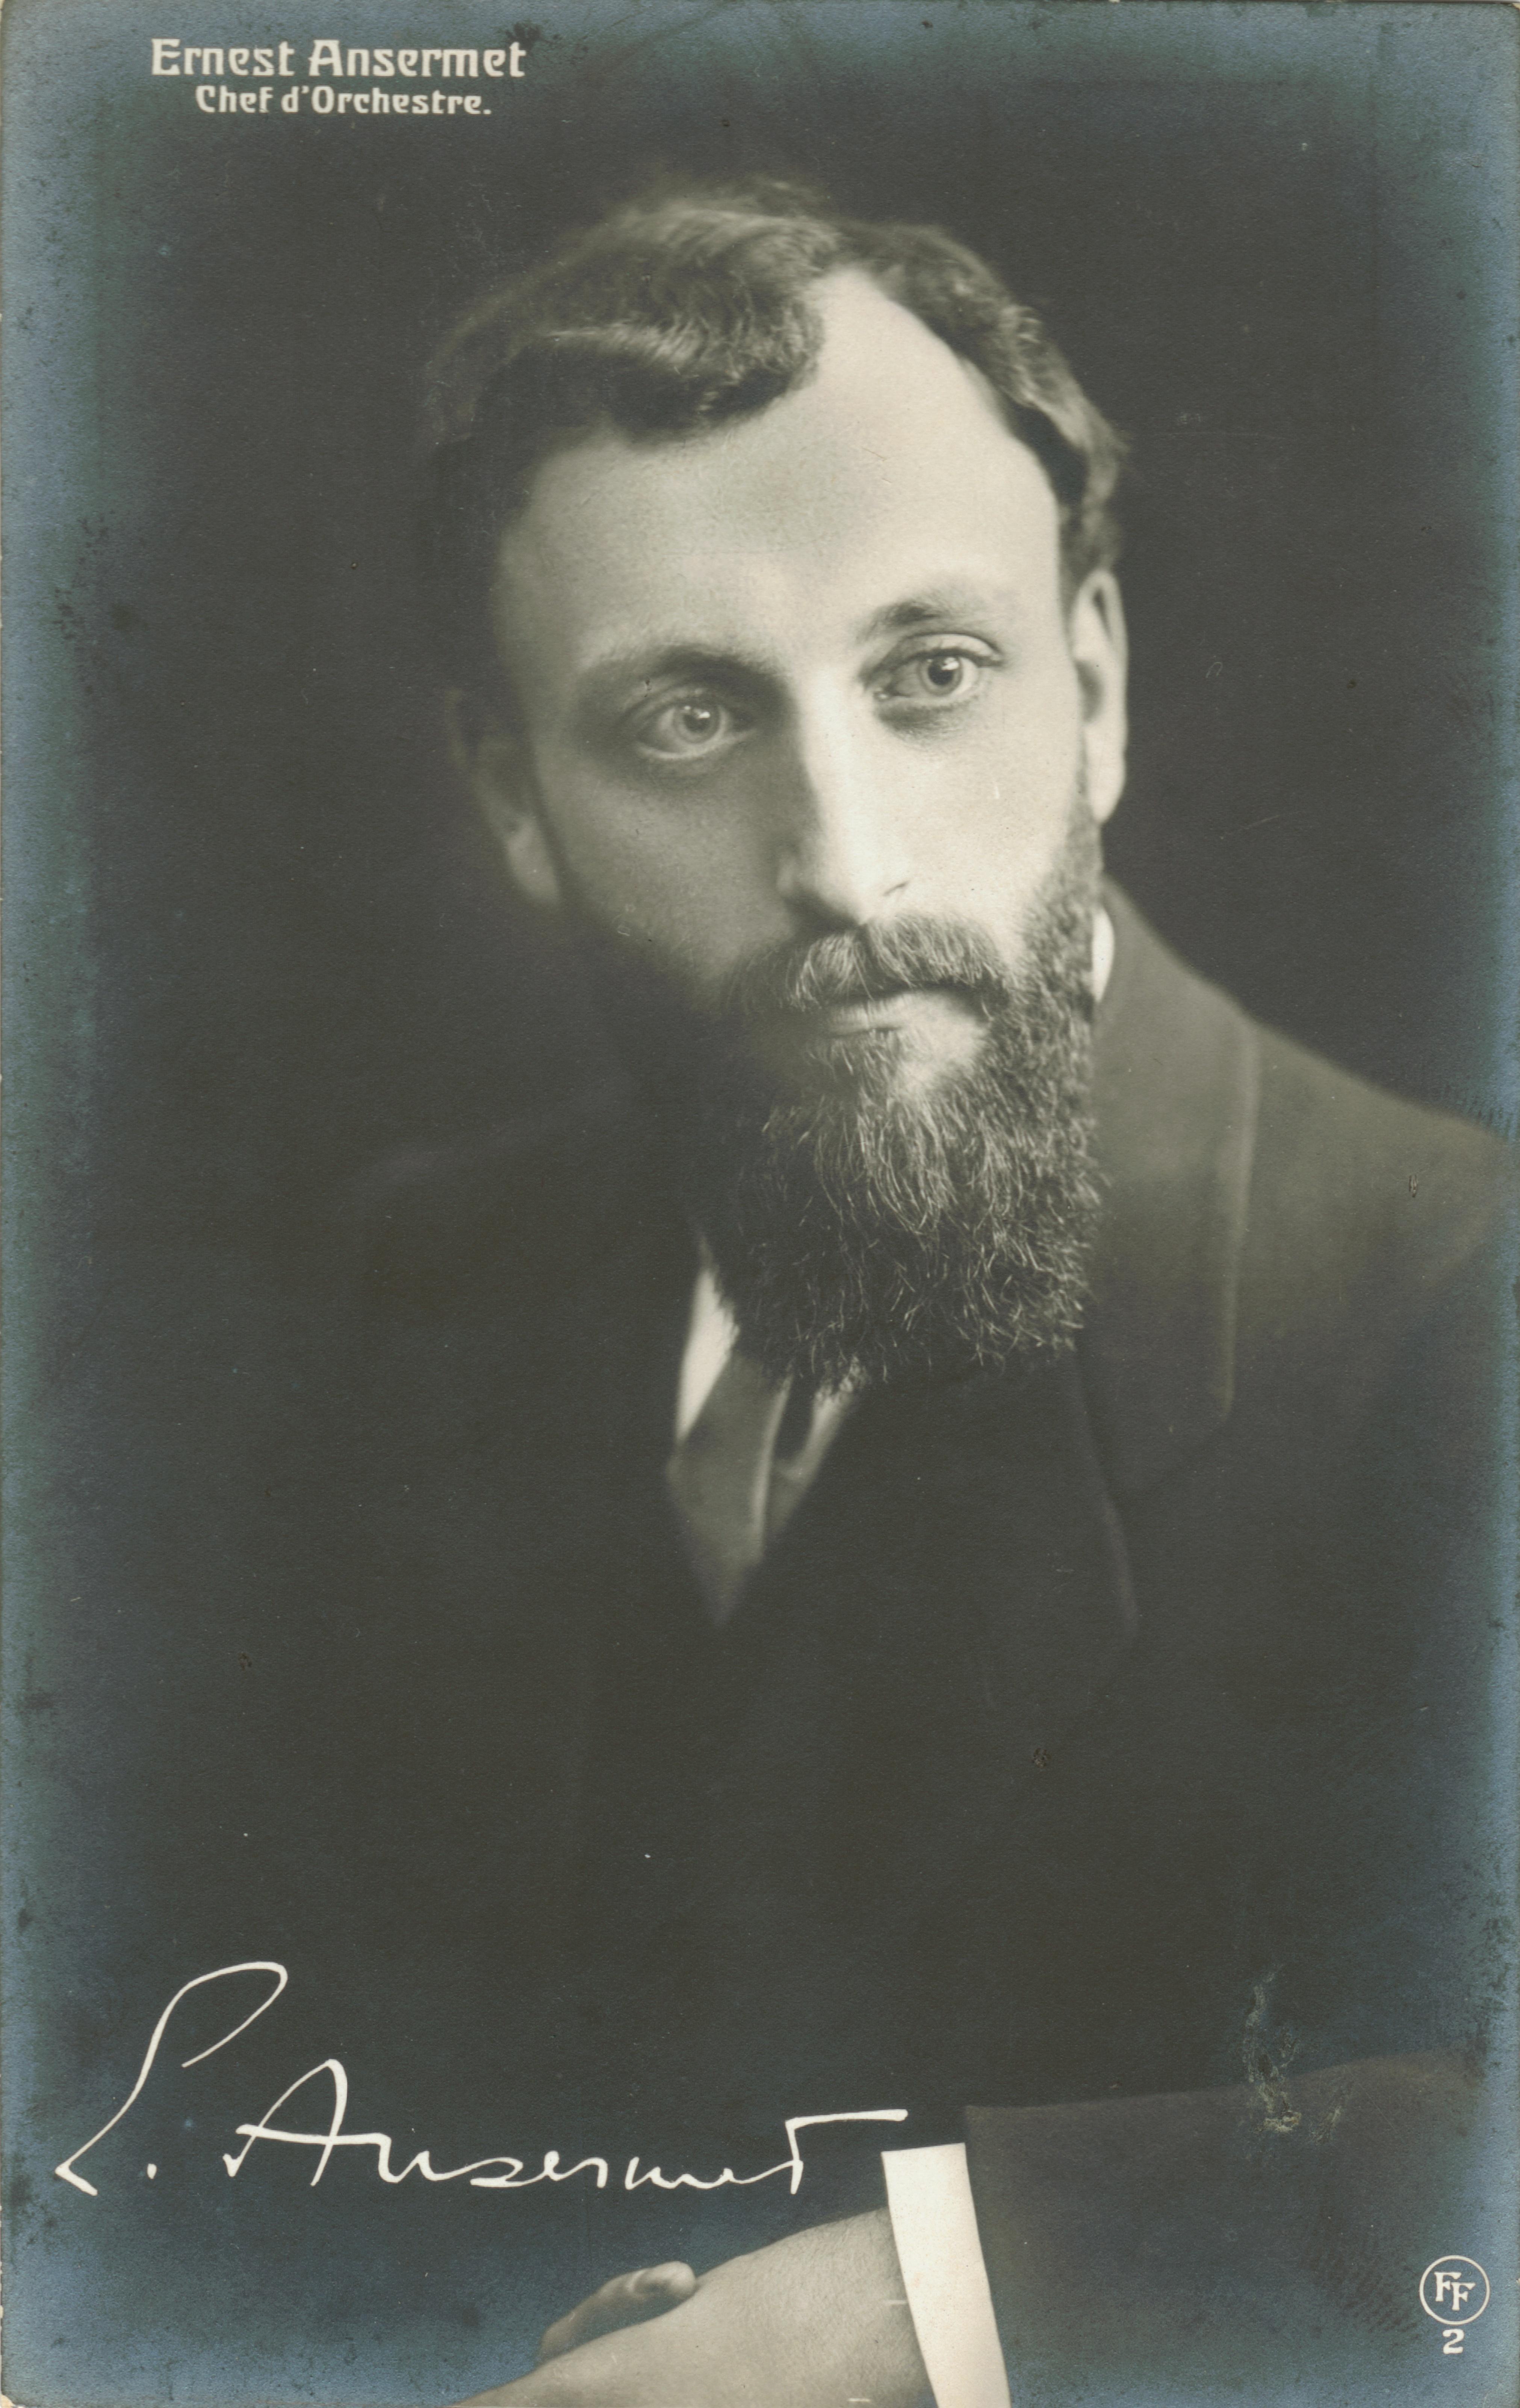 Le jeune Ernest ANSERMET, 1909, carte postale Foetisch Frères